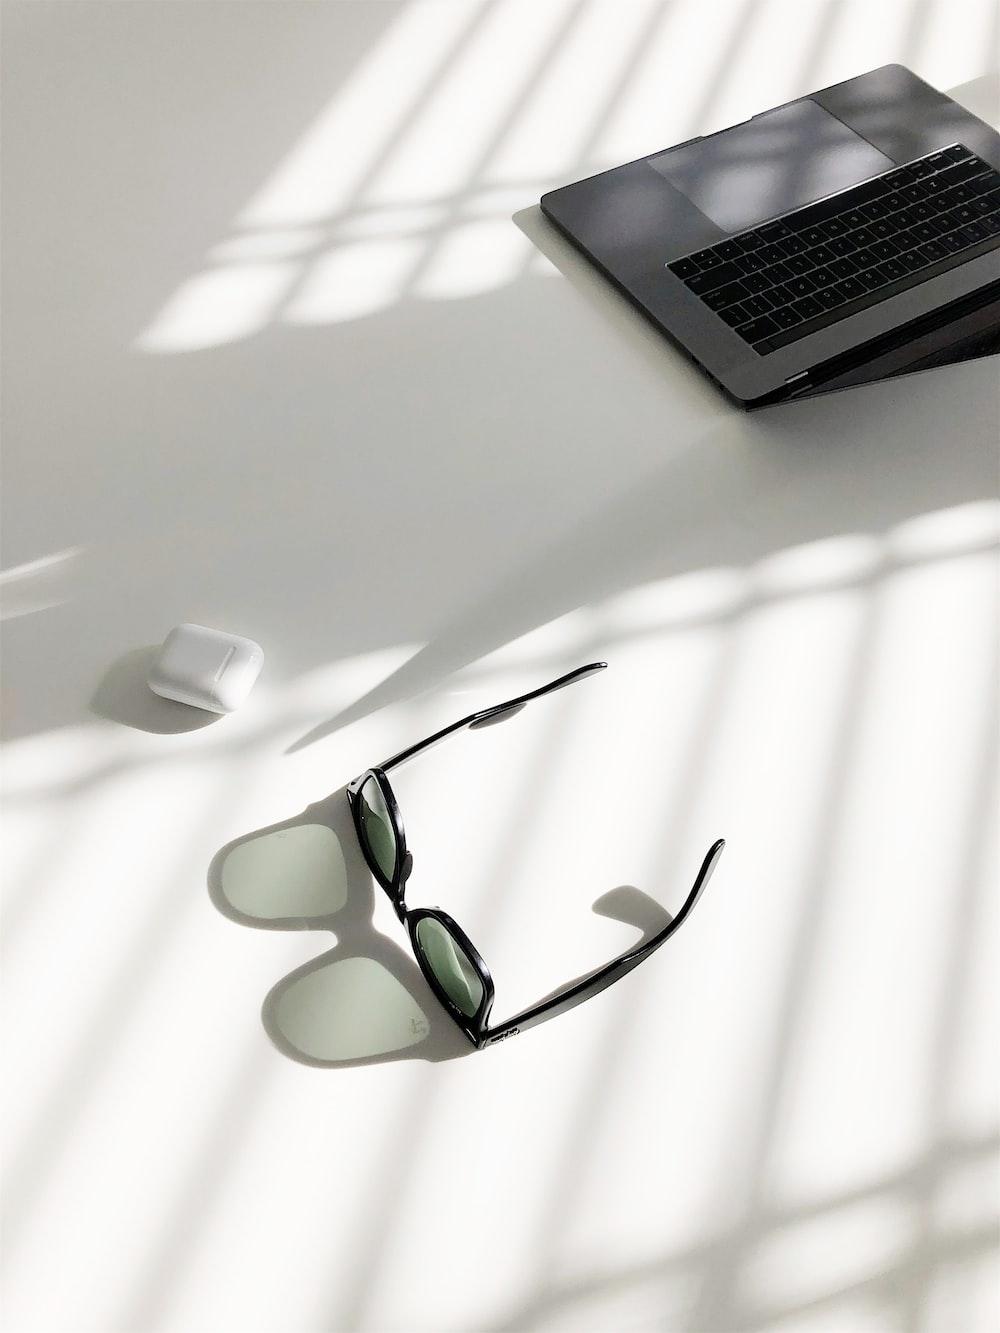 flat-lay photography of wayfarer-style sunglasses and MacBook Pro